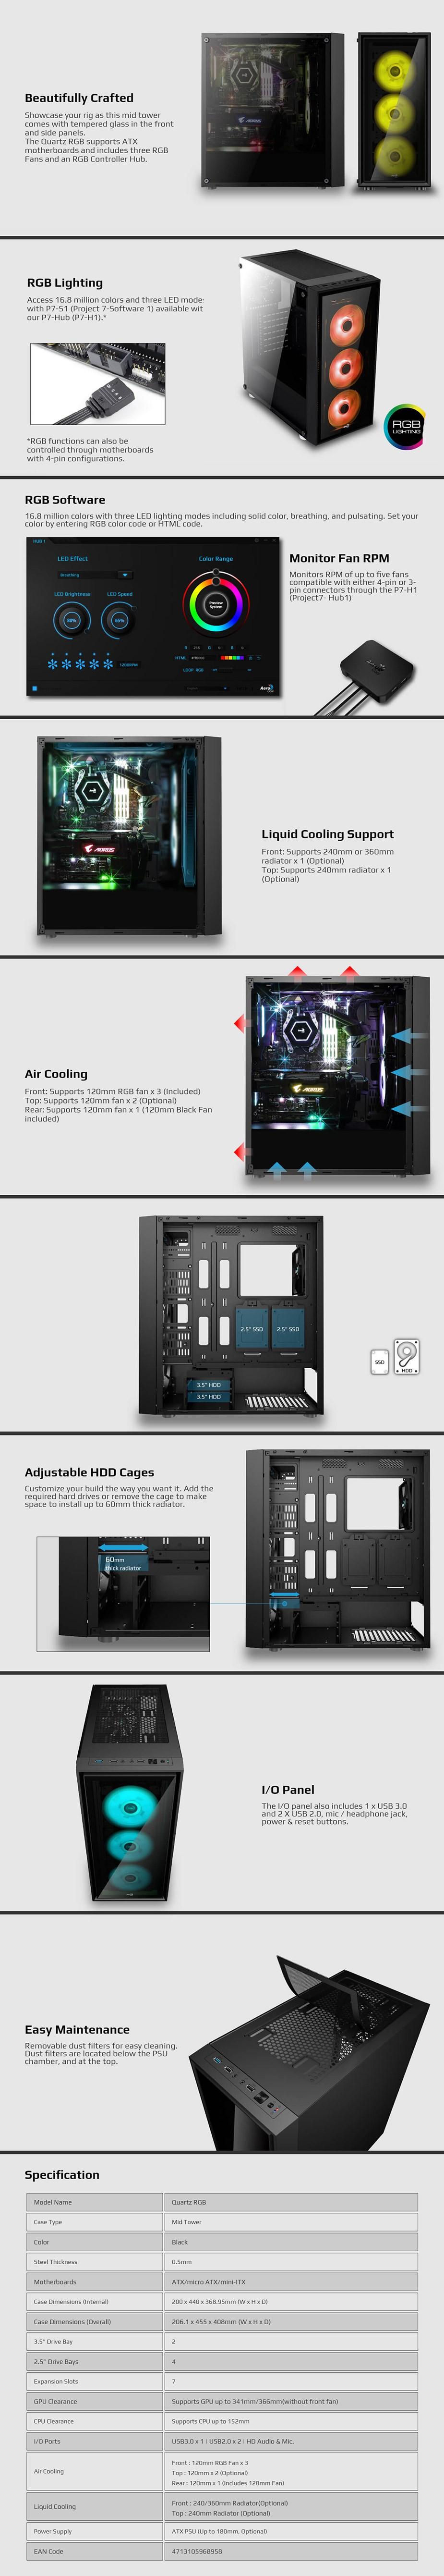 Aerocool Quartz RGB Tempered Glass Mid-Tower ATX Case - Desktop Overview 2